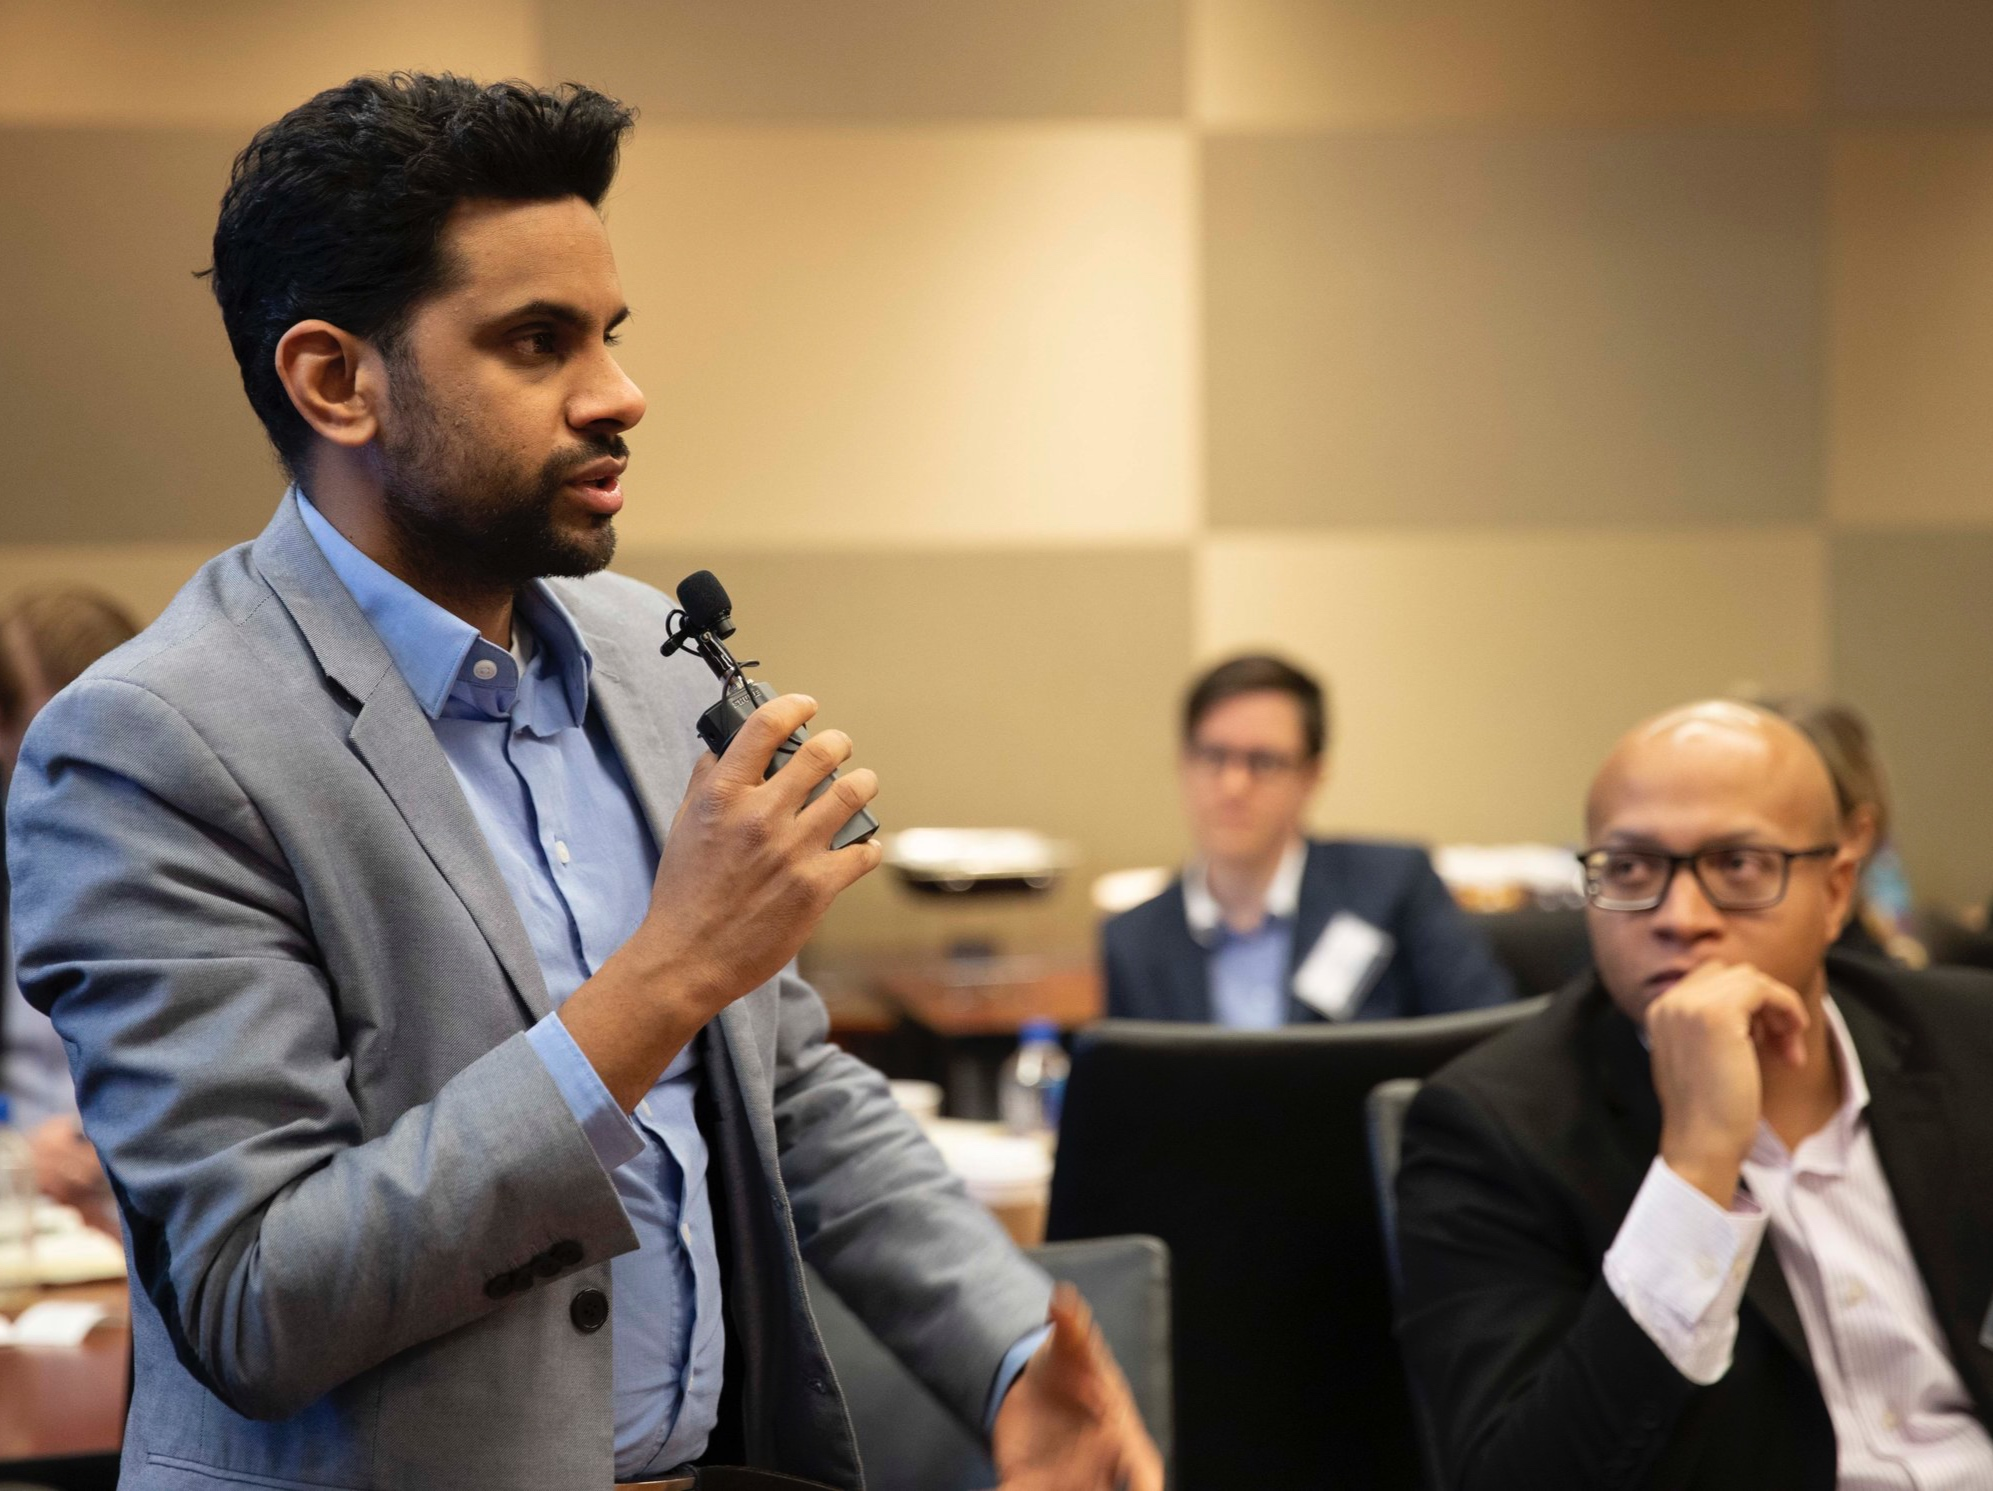 Vignesh Krishnamurthy, Senior Manager of City Solutions, Ford Smart Mobility